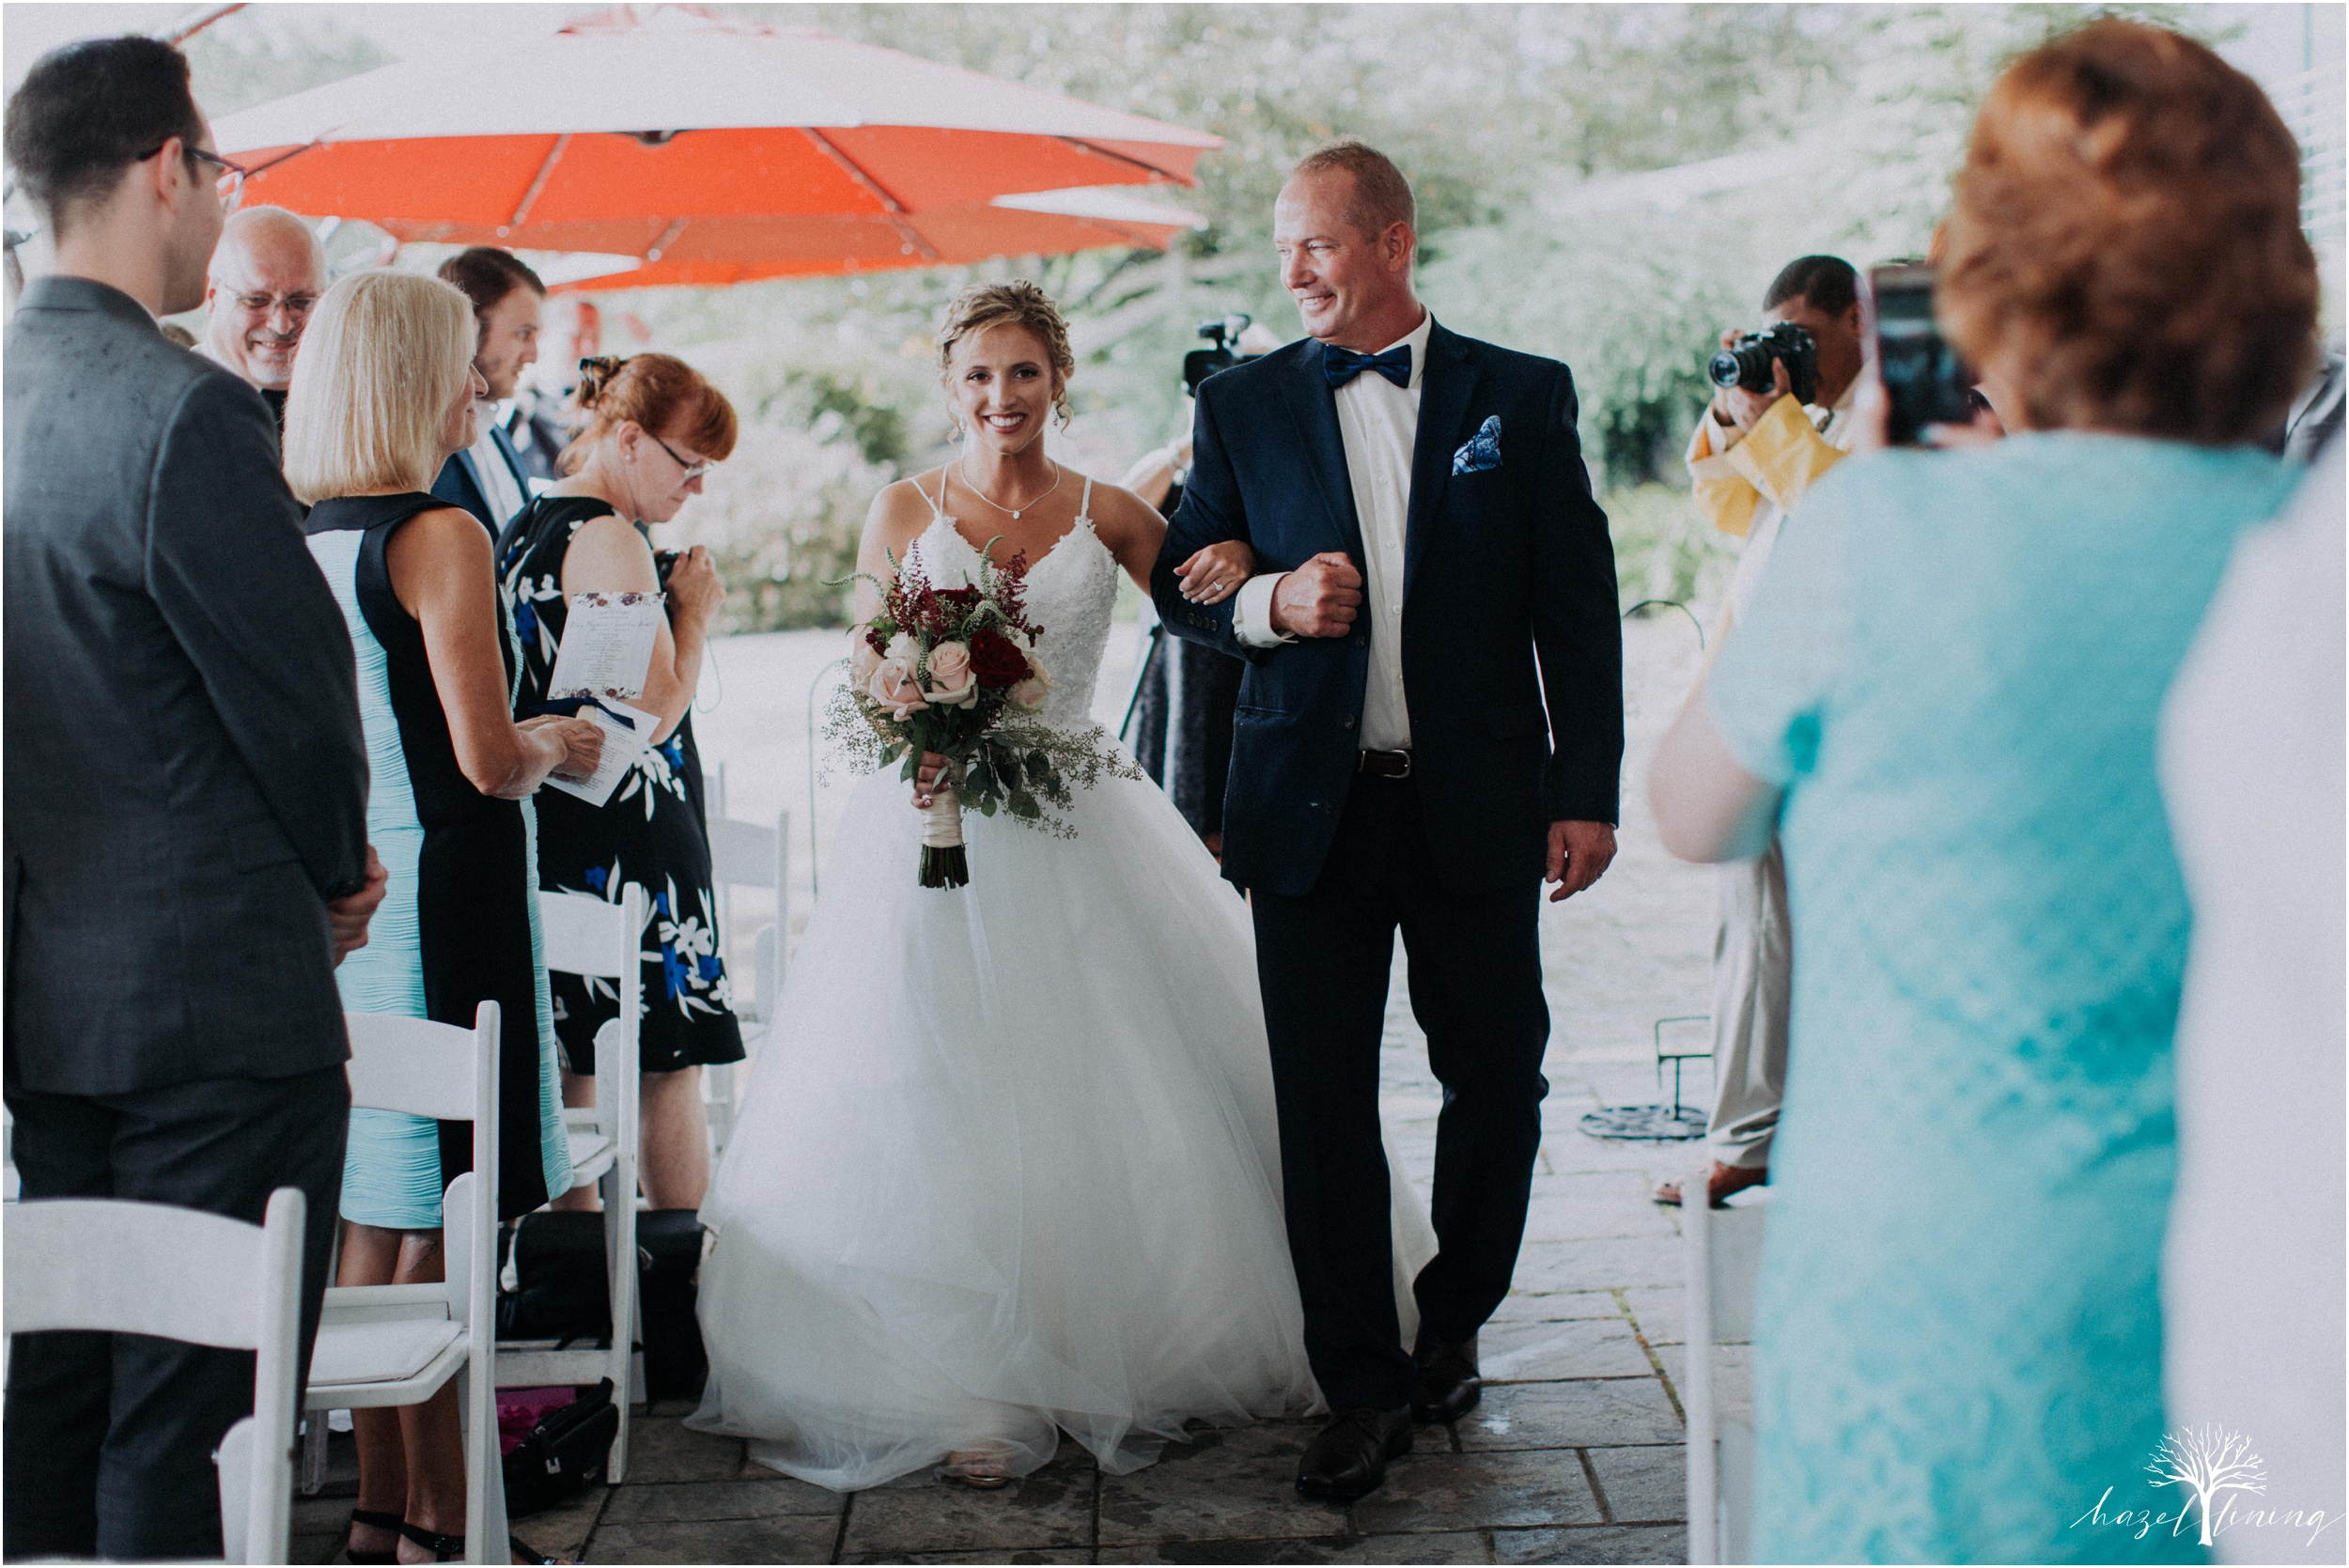 jonathan-weibel-becky-haywood-loft-at-sweetwater-cc-pennsburg-pennsylvania-rainy-day-summer-wedding-hazel-lining-travel-wedding-elopement-photography_0041.jpg